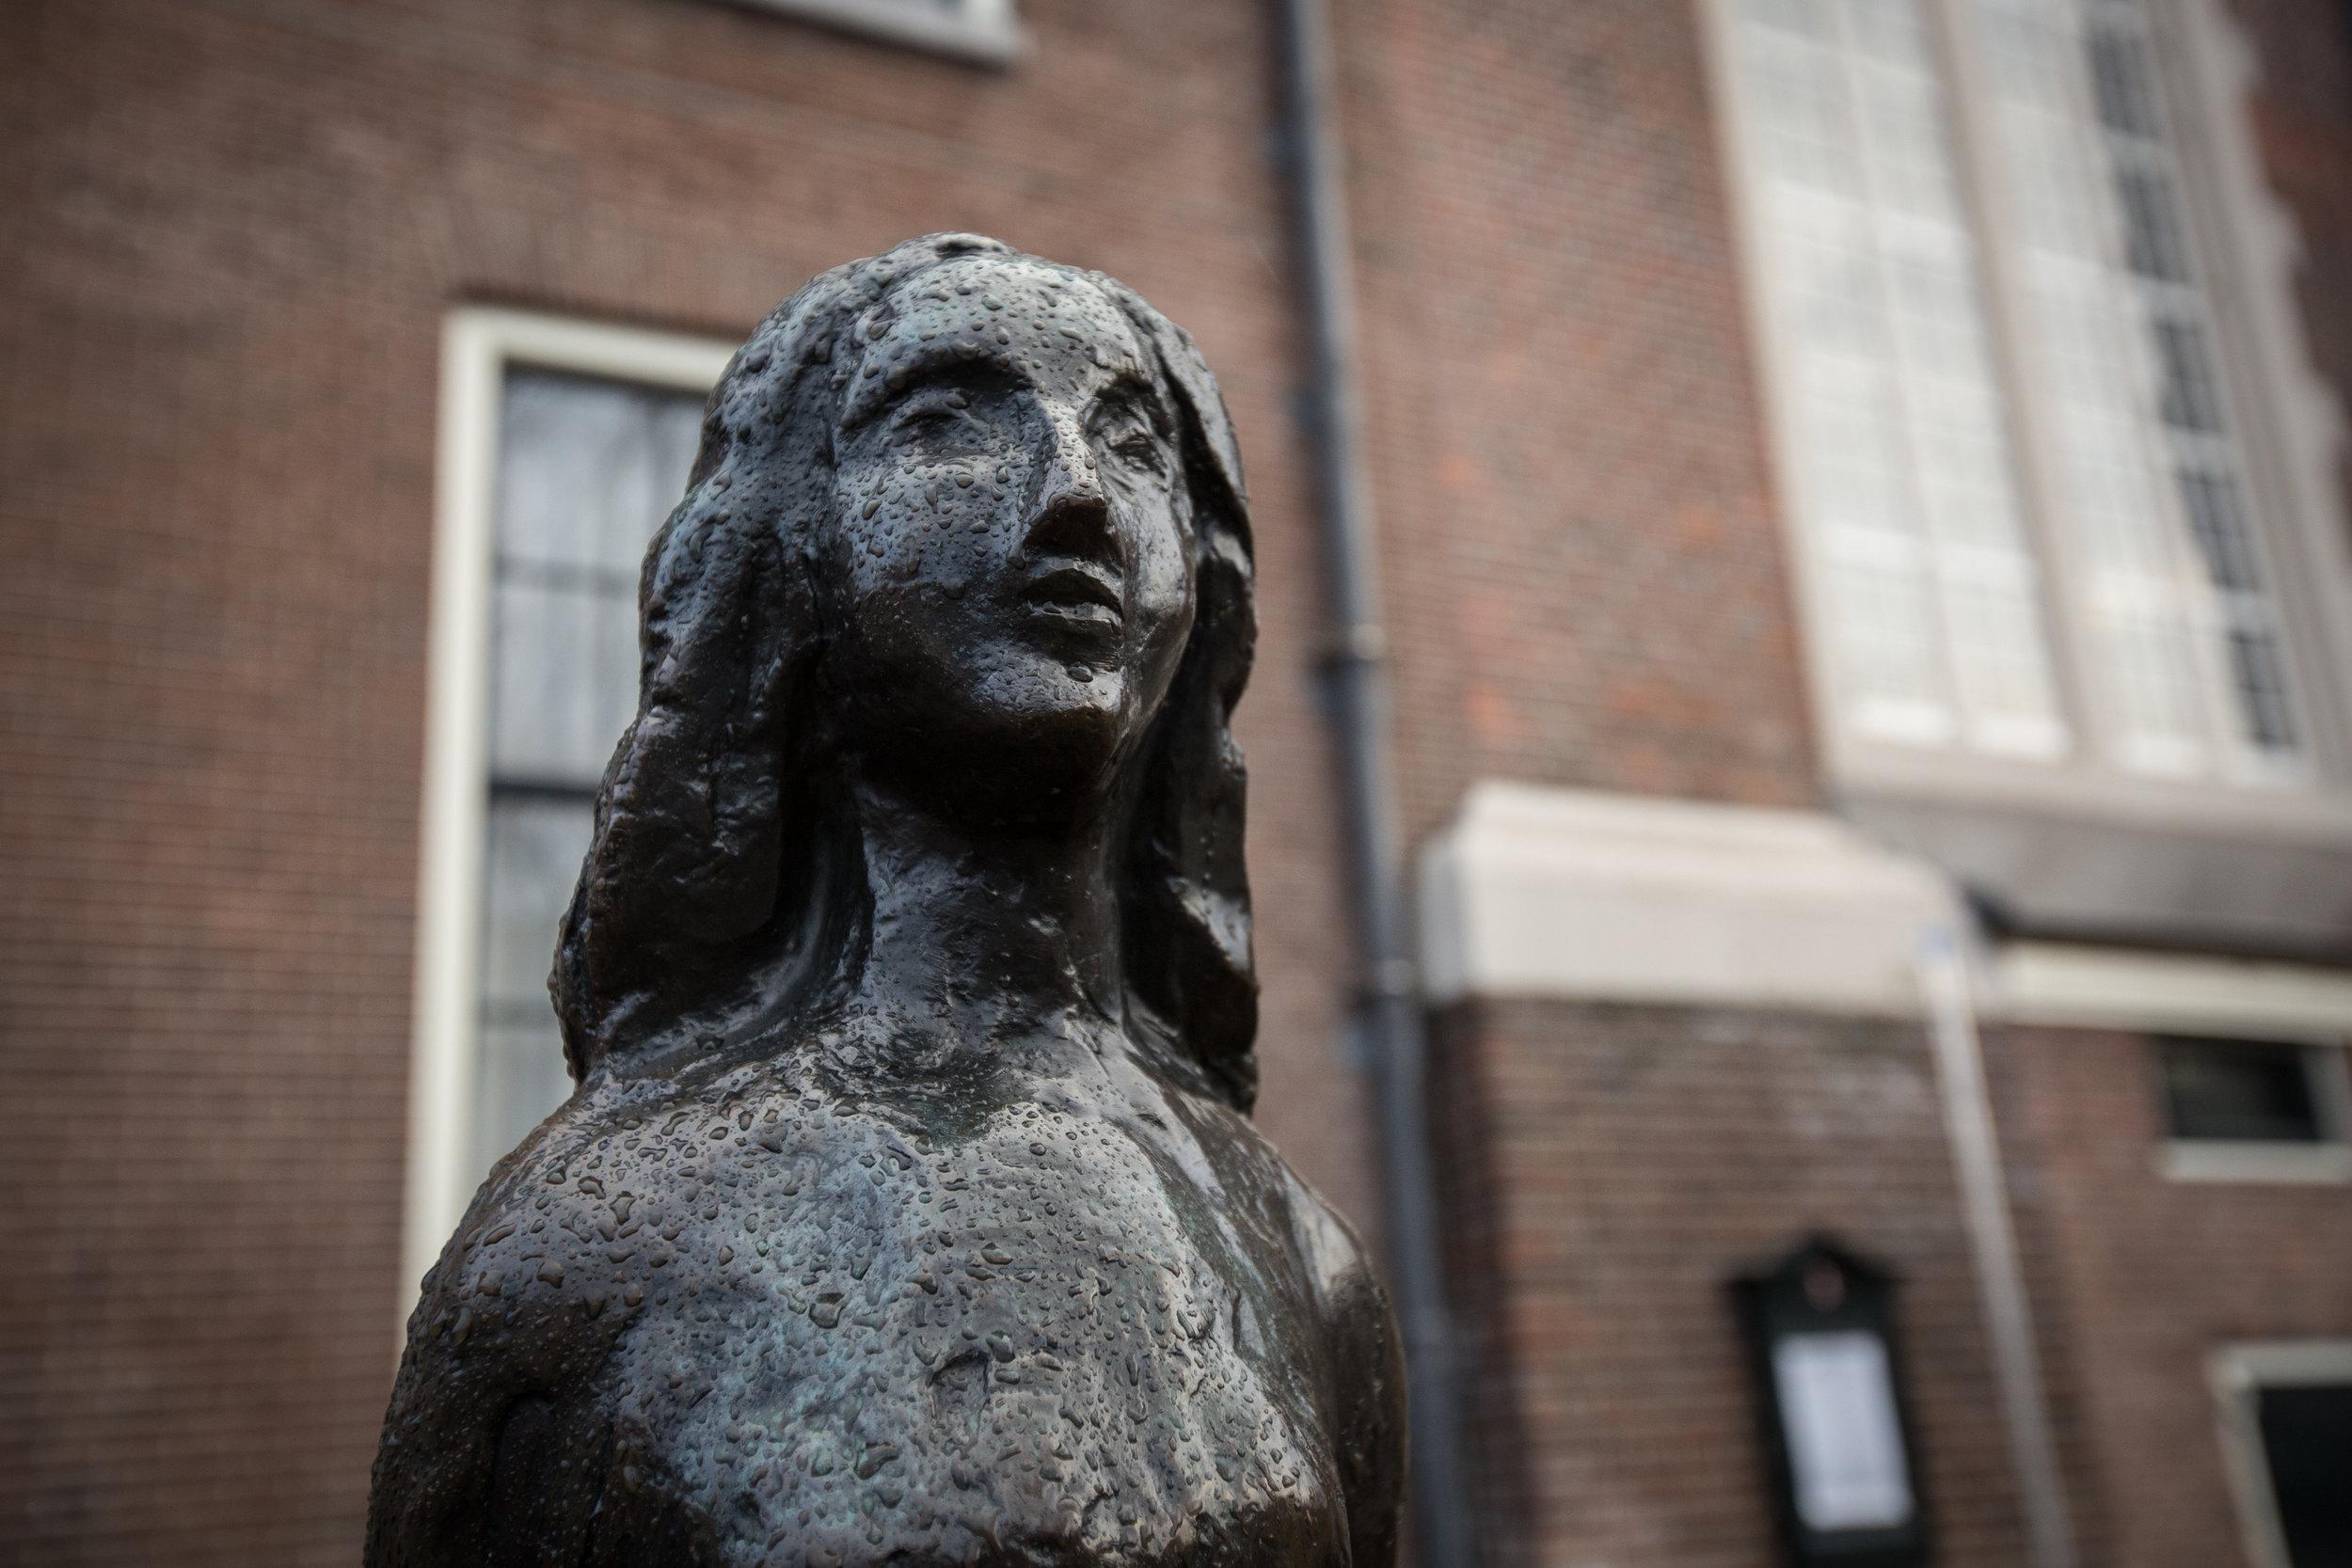 TRTN_Amsterdam_012018-7242.jpg